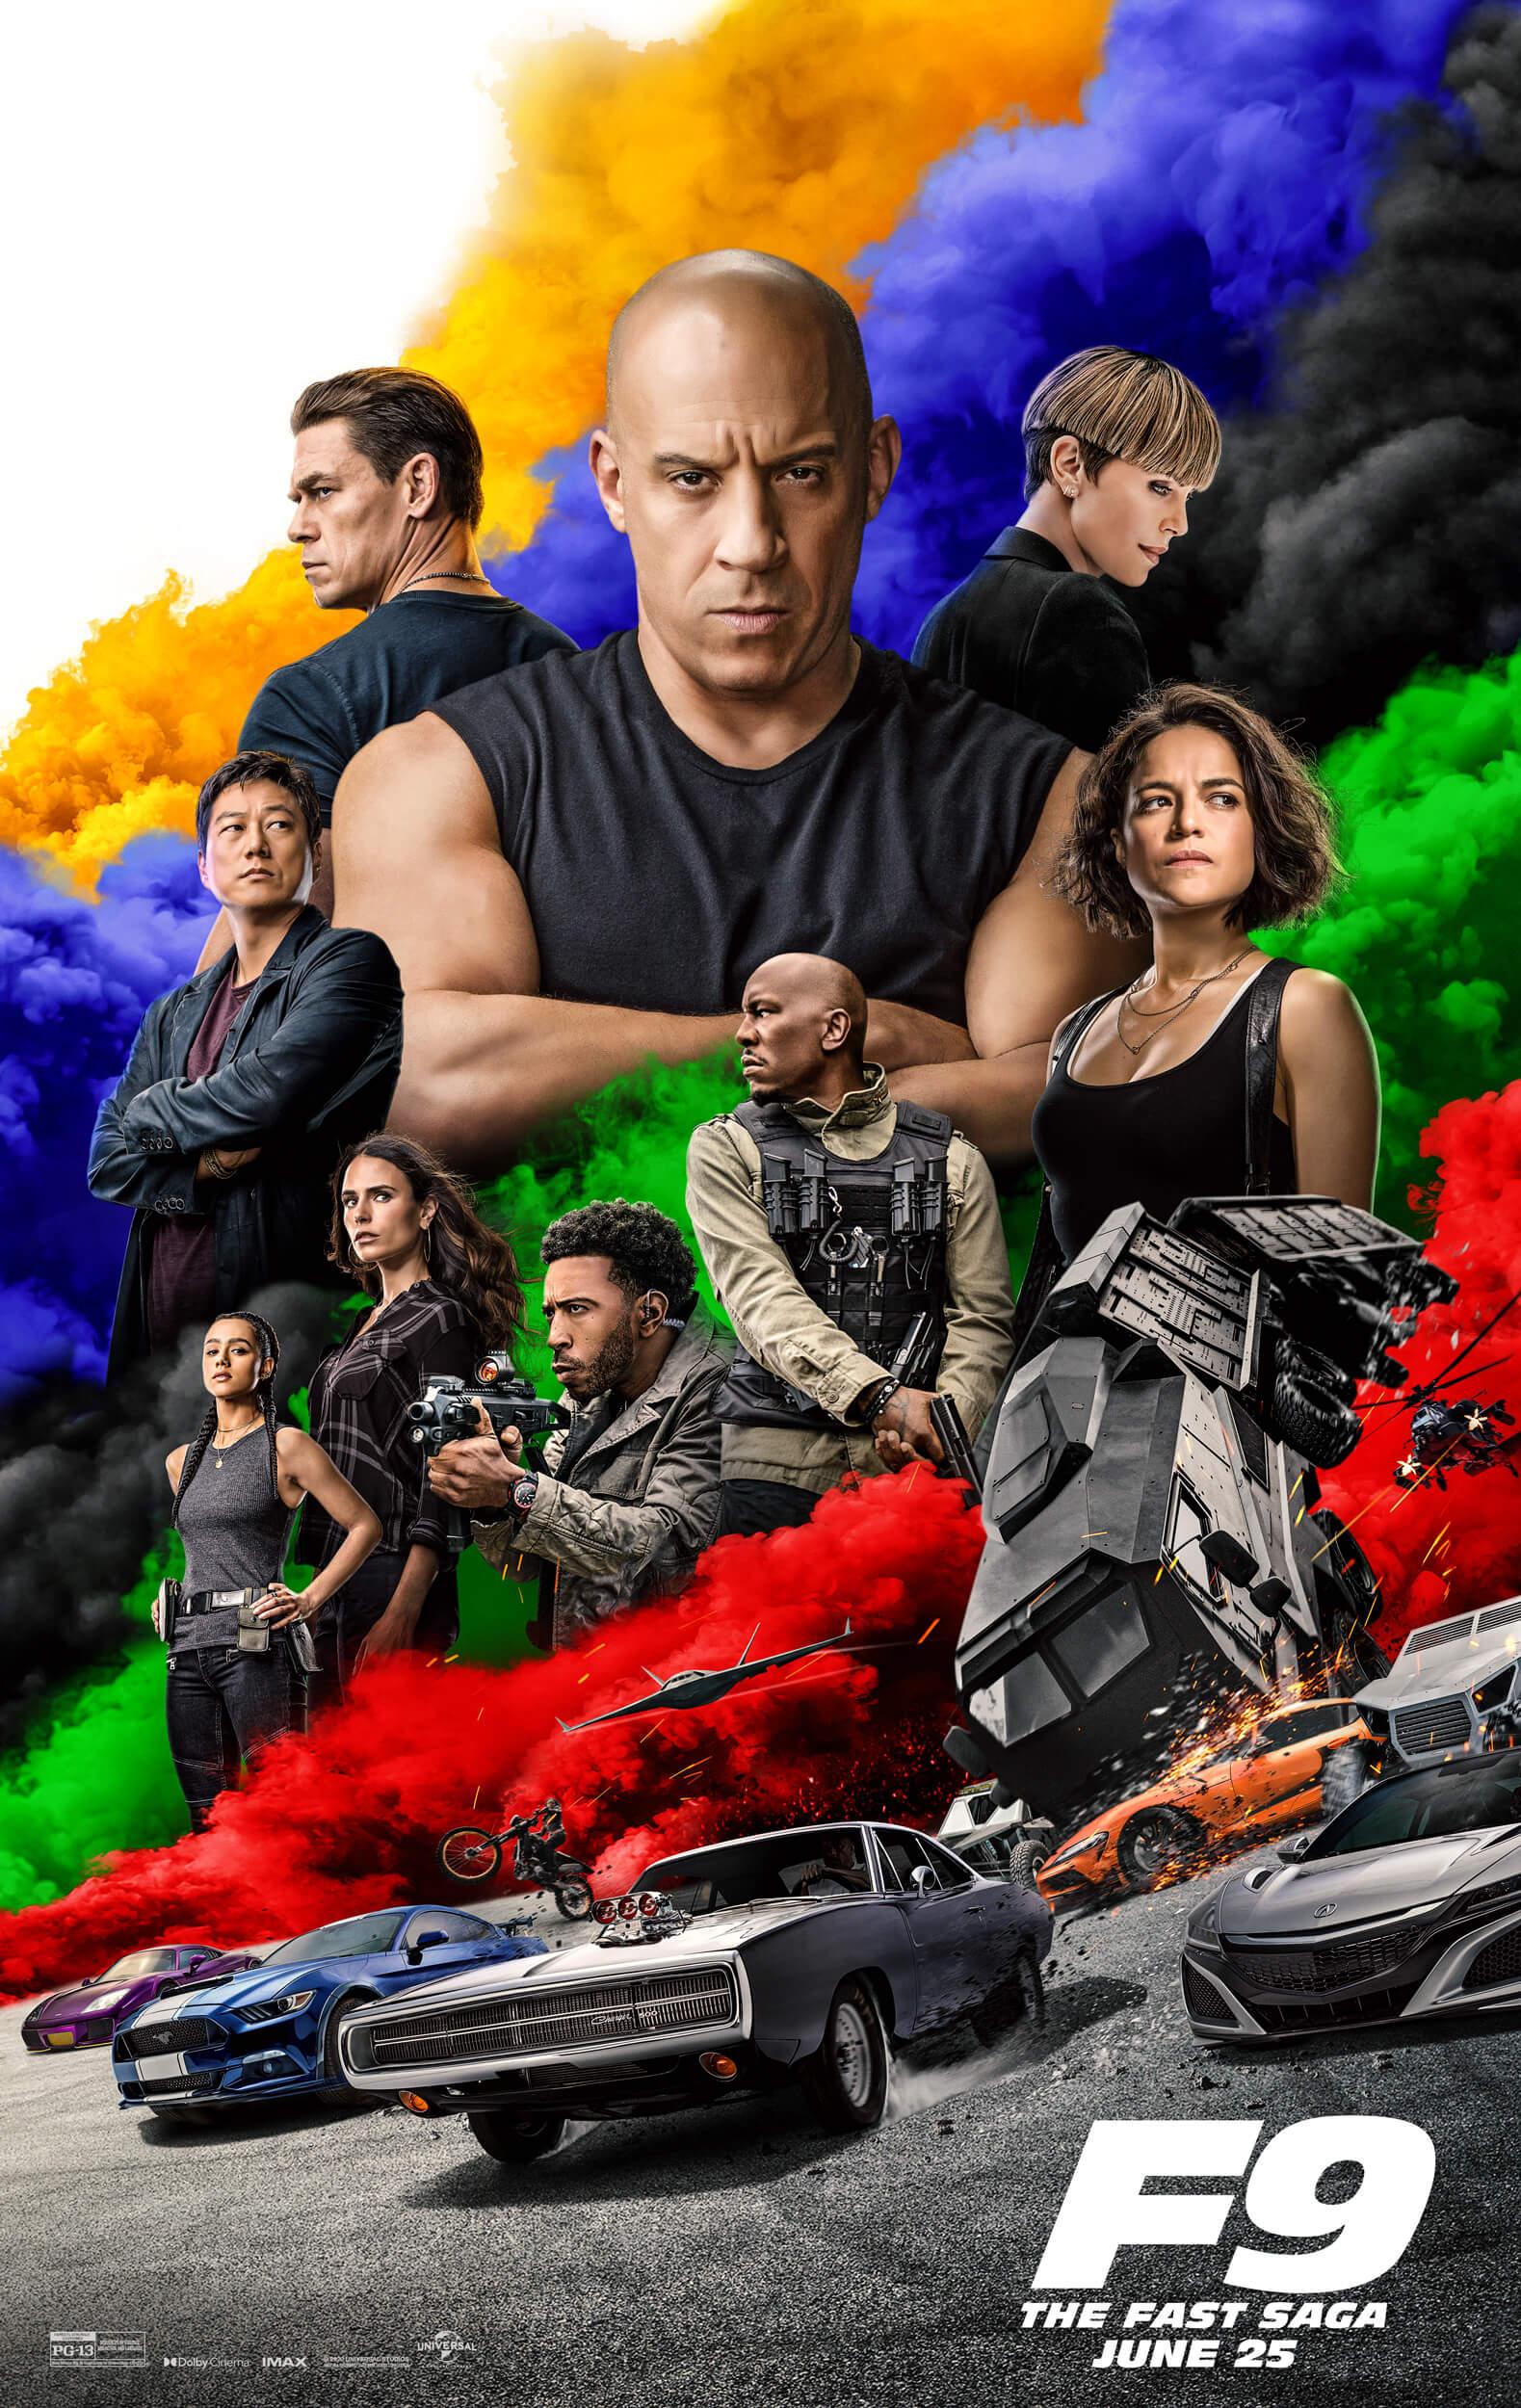 F9 : Fast Saga Movie Poster